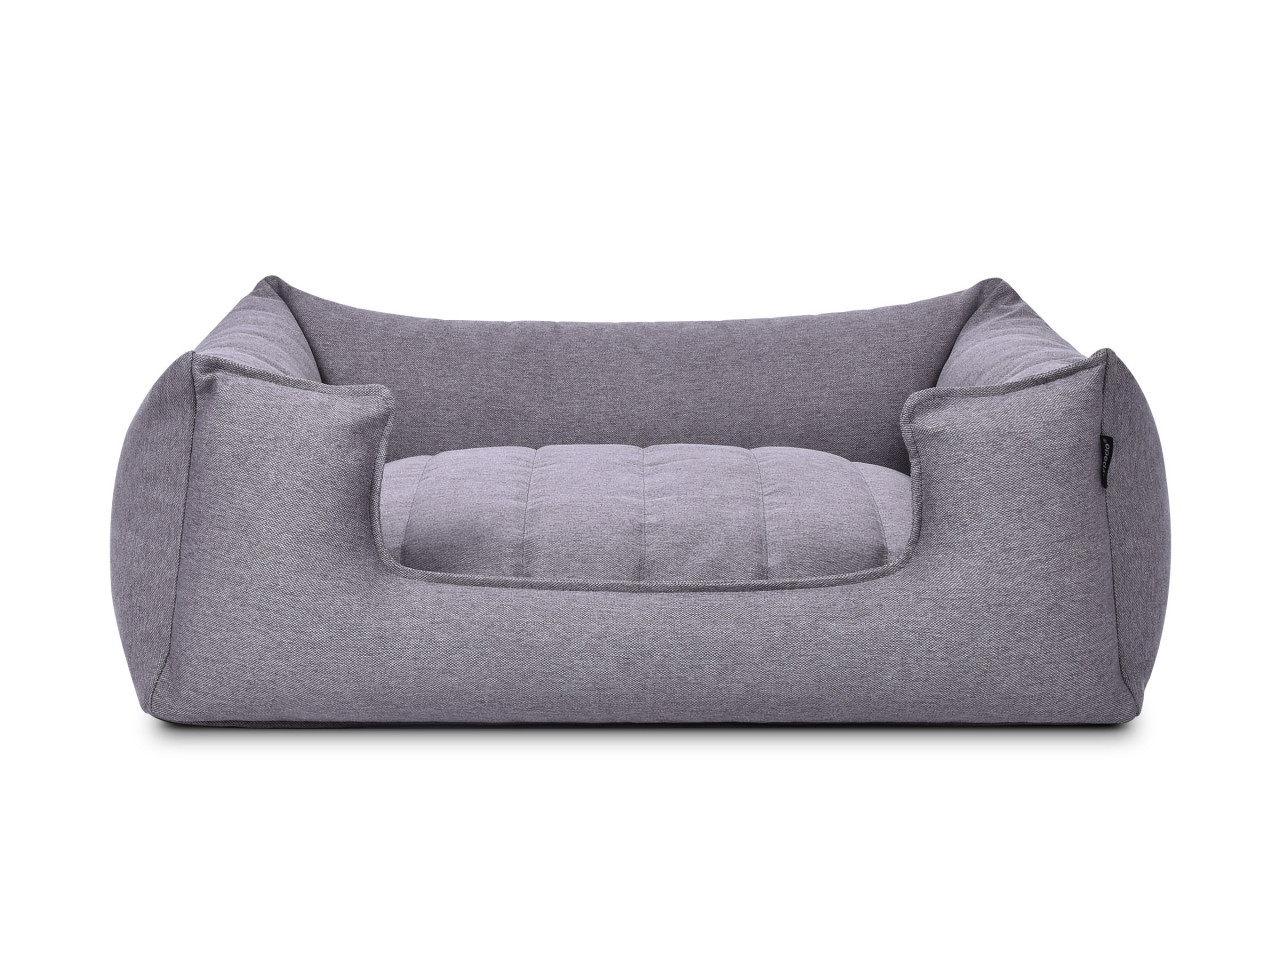 hundebett-NORDIC-basic-grey-1